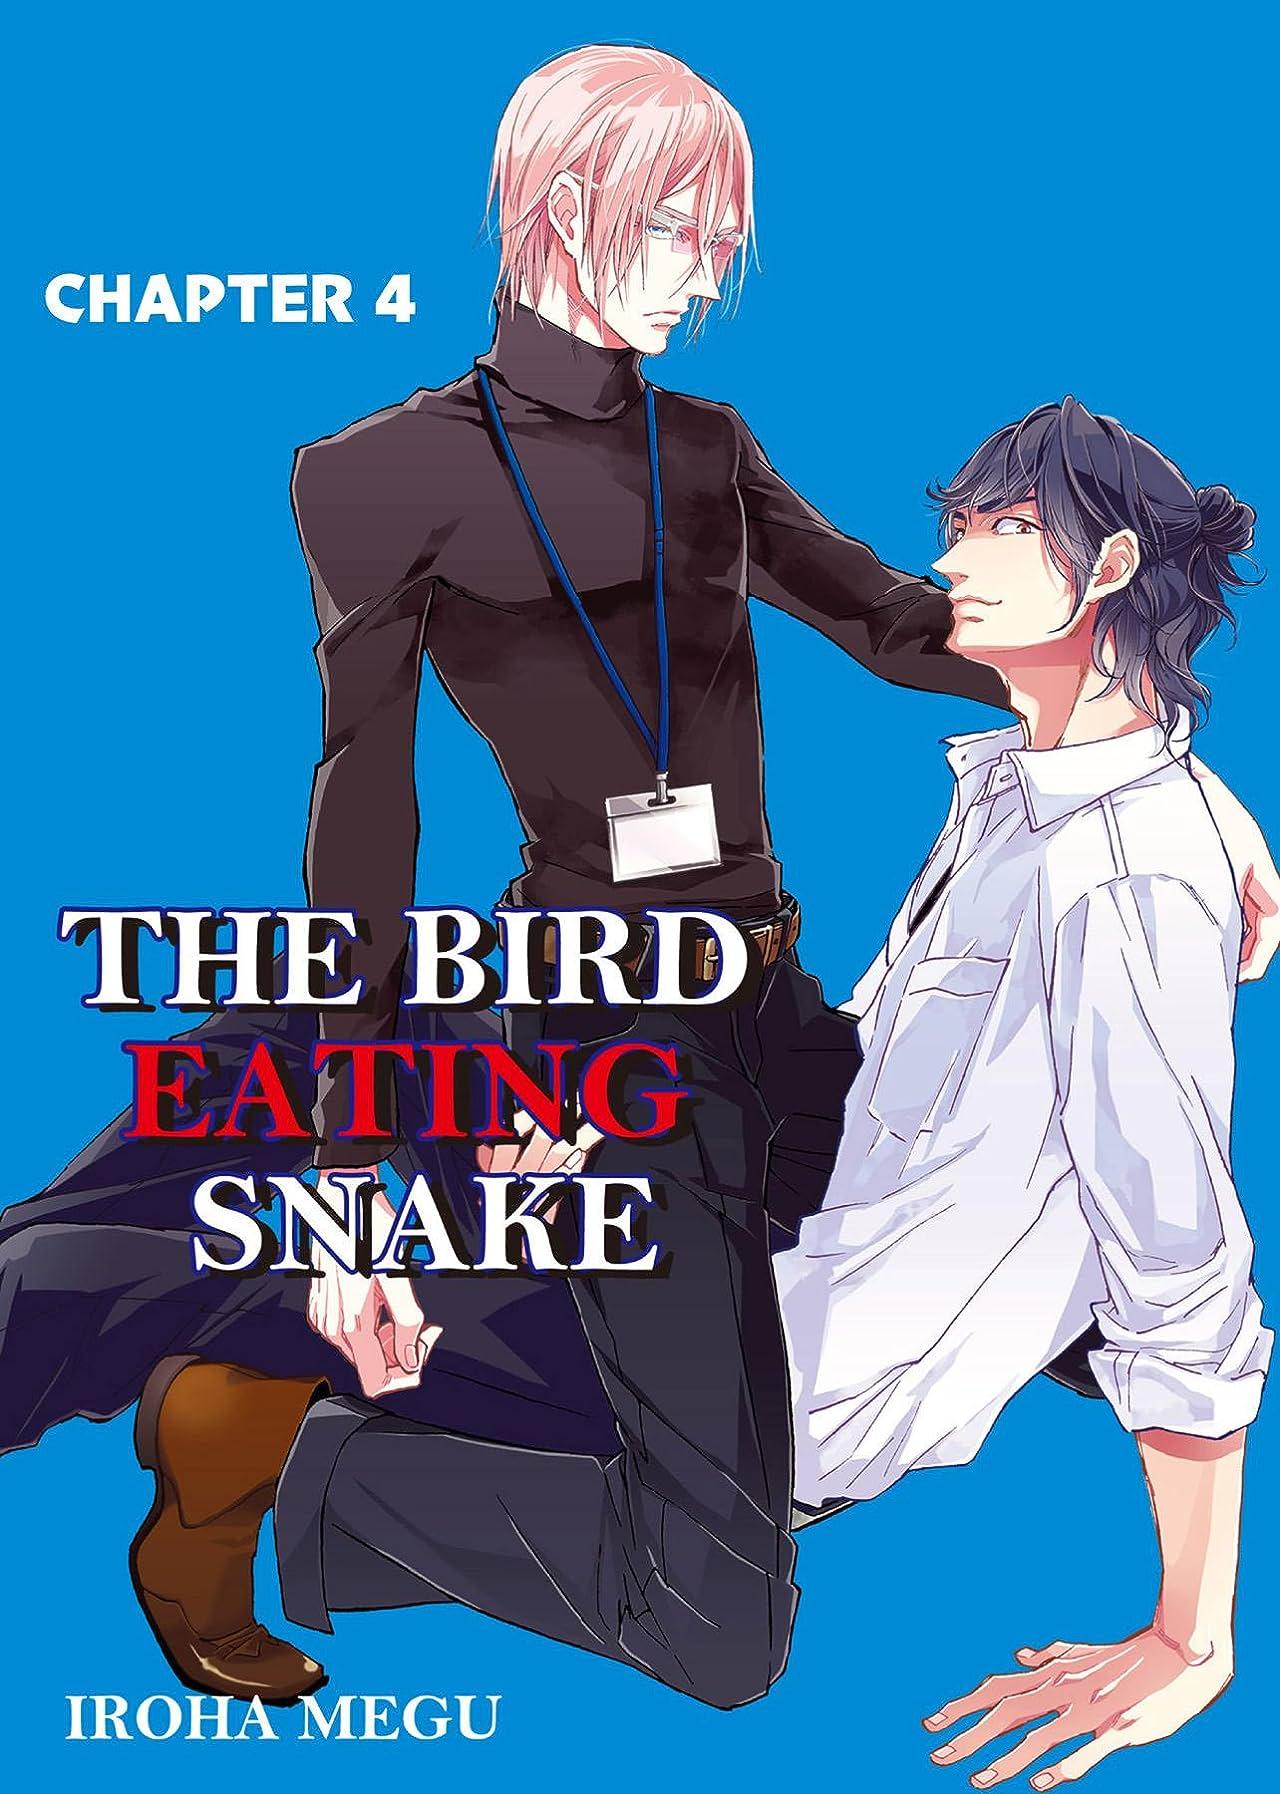 THE BIRD EATING SNAKE (Yaoi Manga) #4